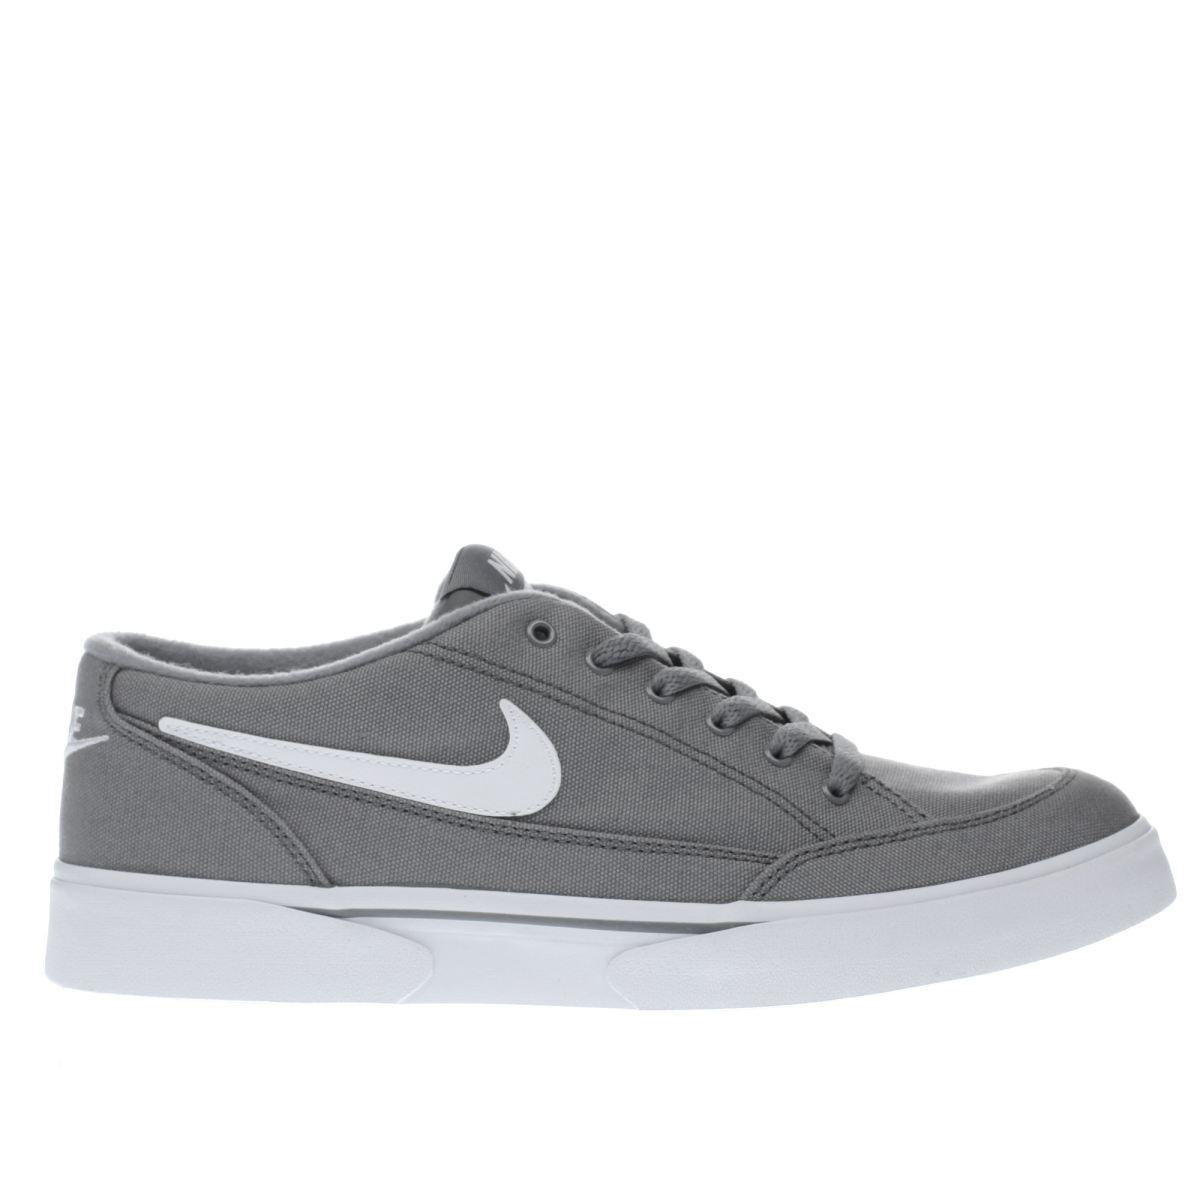 nike grey gts trainers